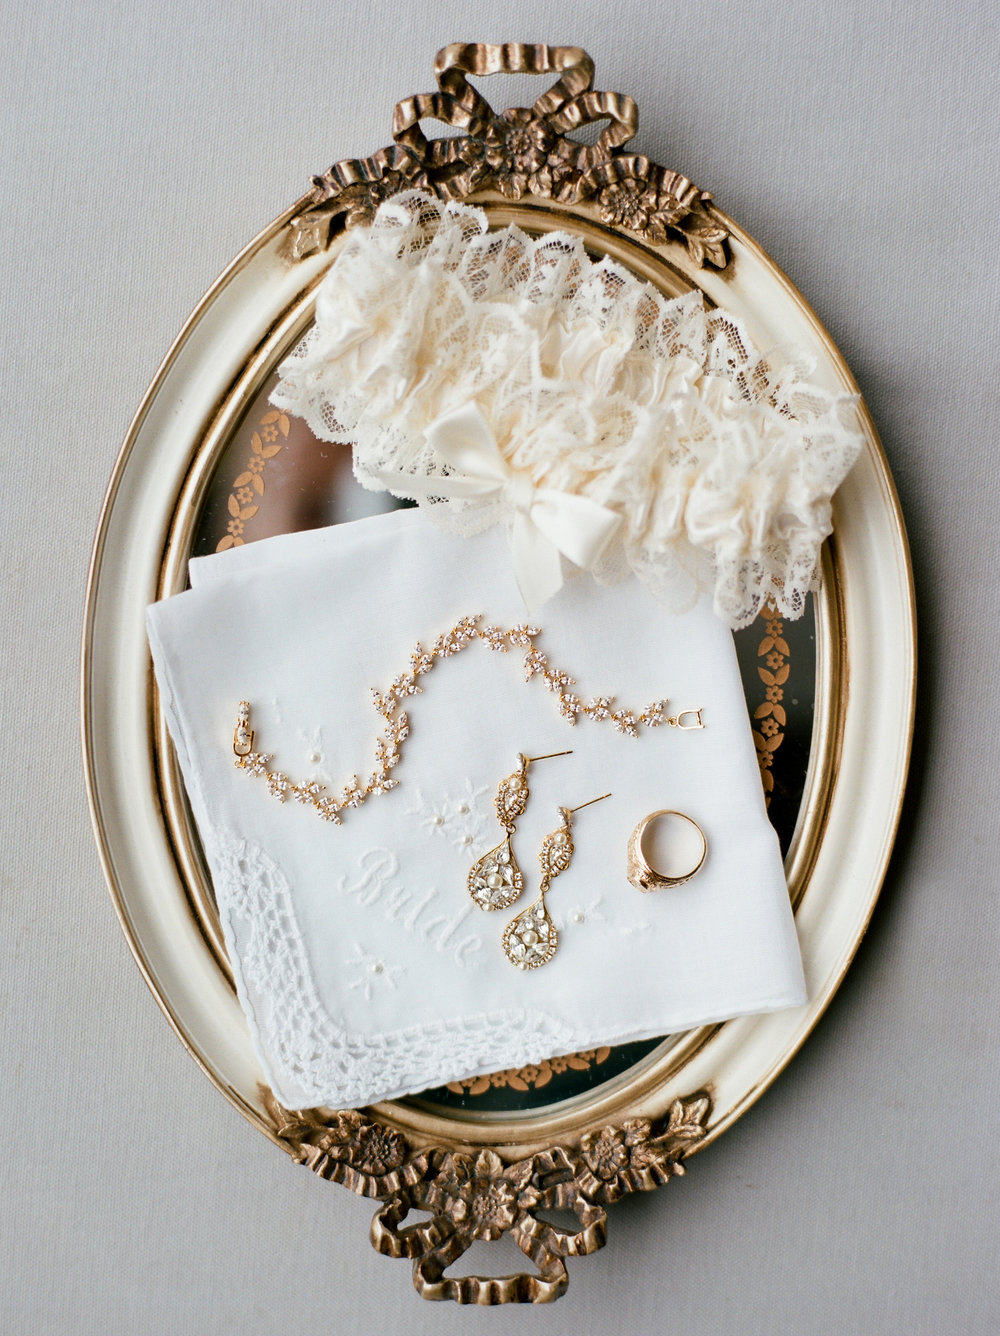 Briscoe-Manor-Houston-Wedding-Photographer-Modern-Luxury-Weddings-Dana-Fernandez-Photograpy-Fine-Art-Photographer-Houston-Film-Destination-PNW-Wedding-Photographer-2.jpg